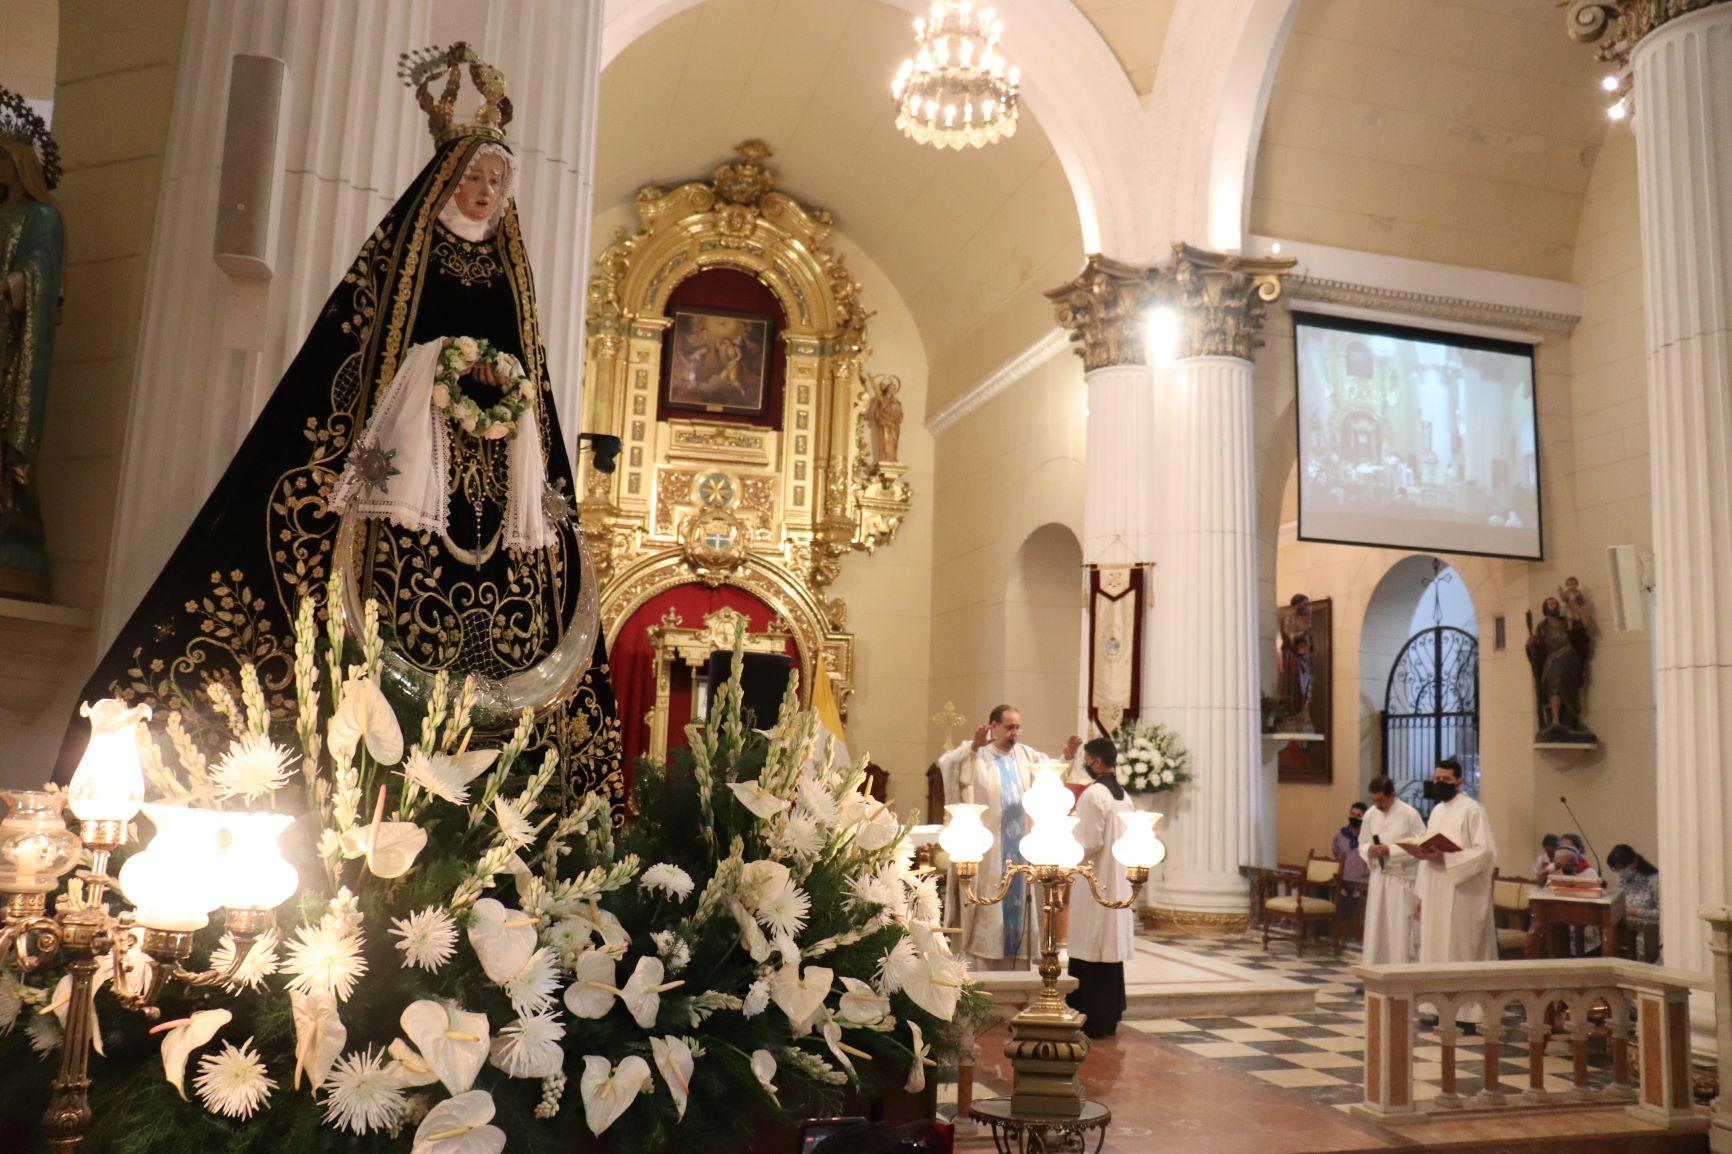 Festividades en honor a la Virgen del Socorro